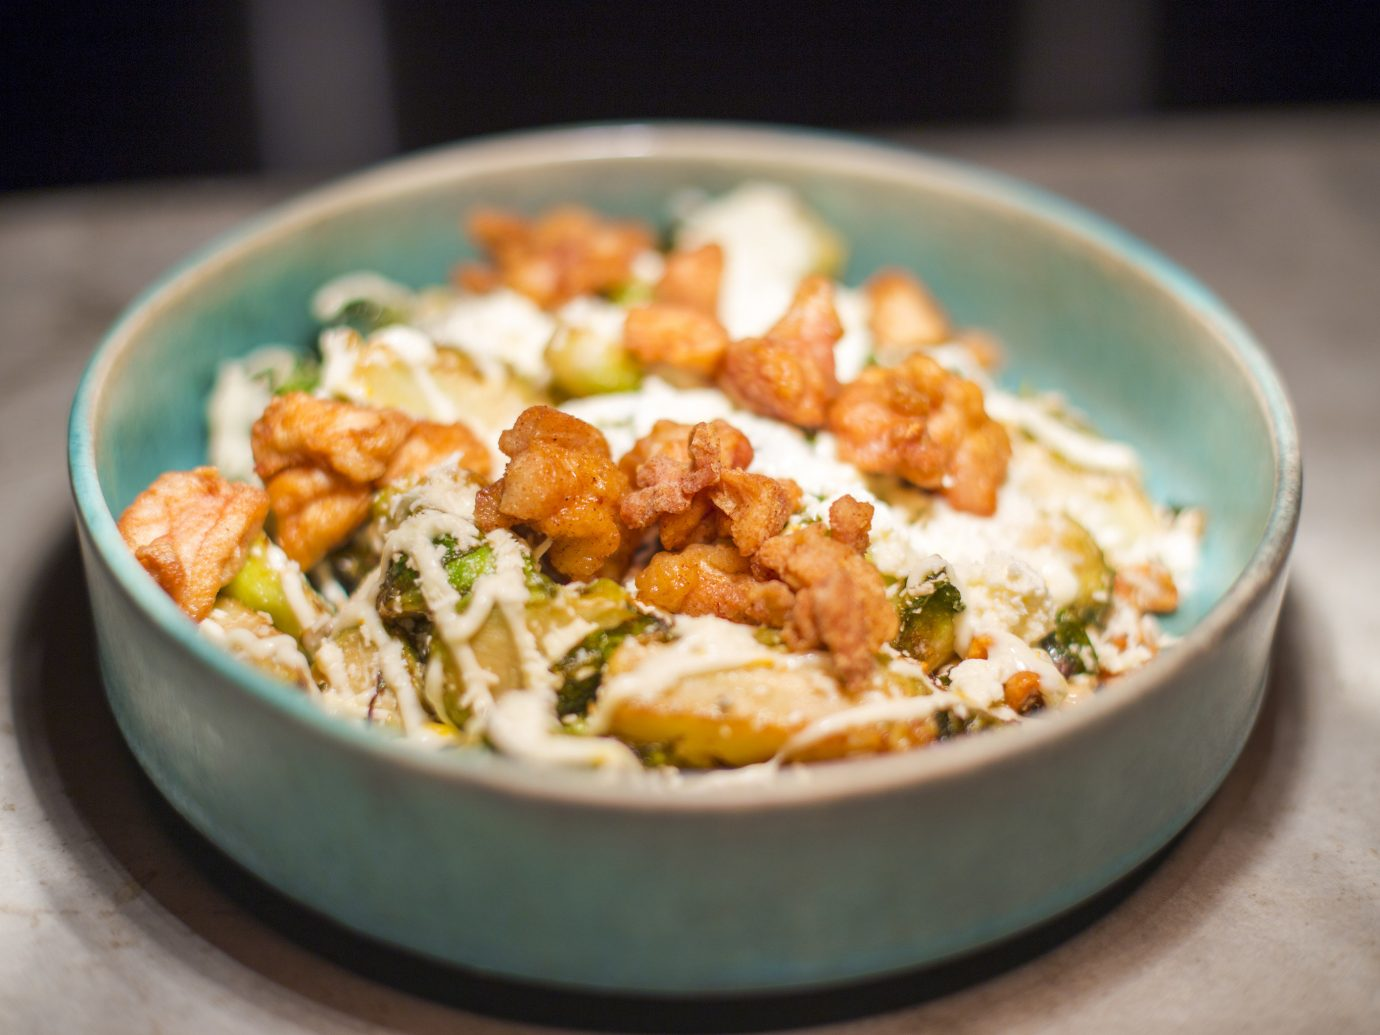 Trip Ideas food dish plate bowl produce meal breakfast cuisine vegetable vegetarian food curry